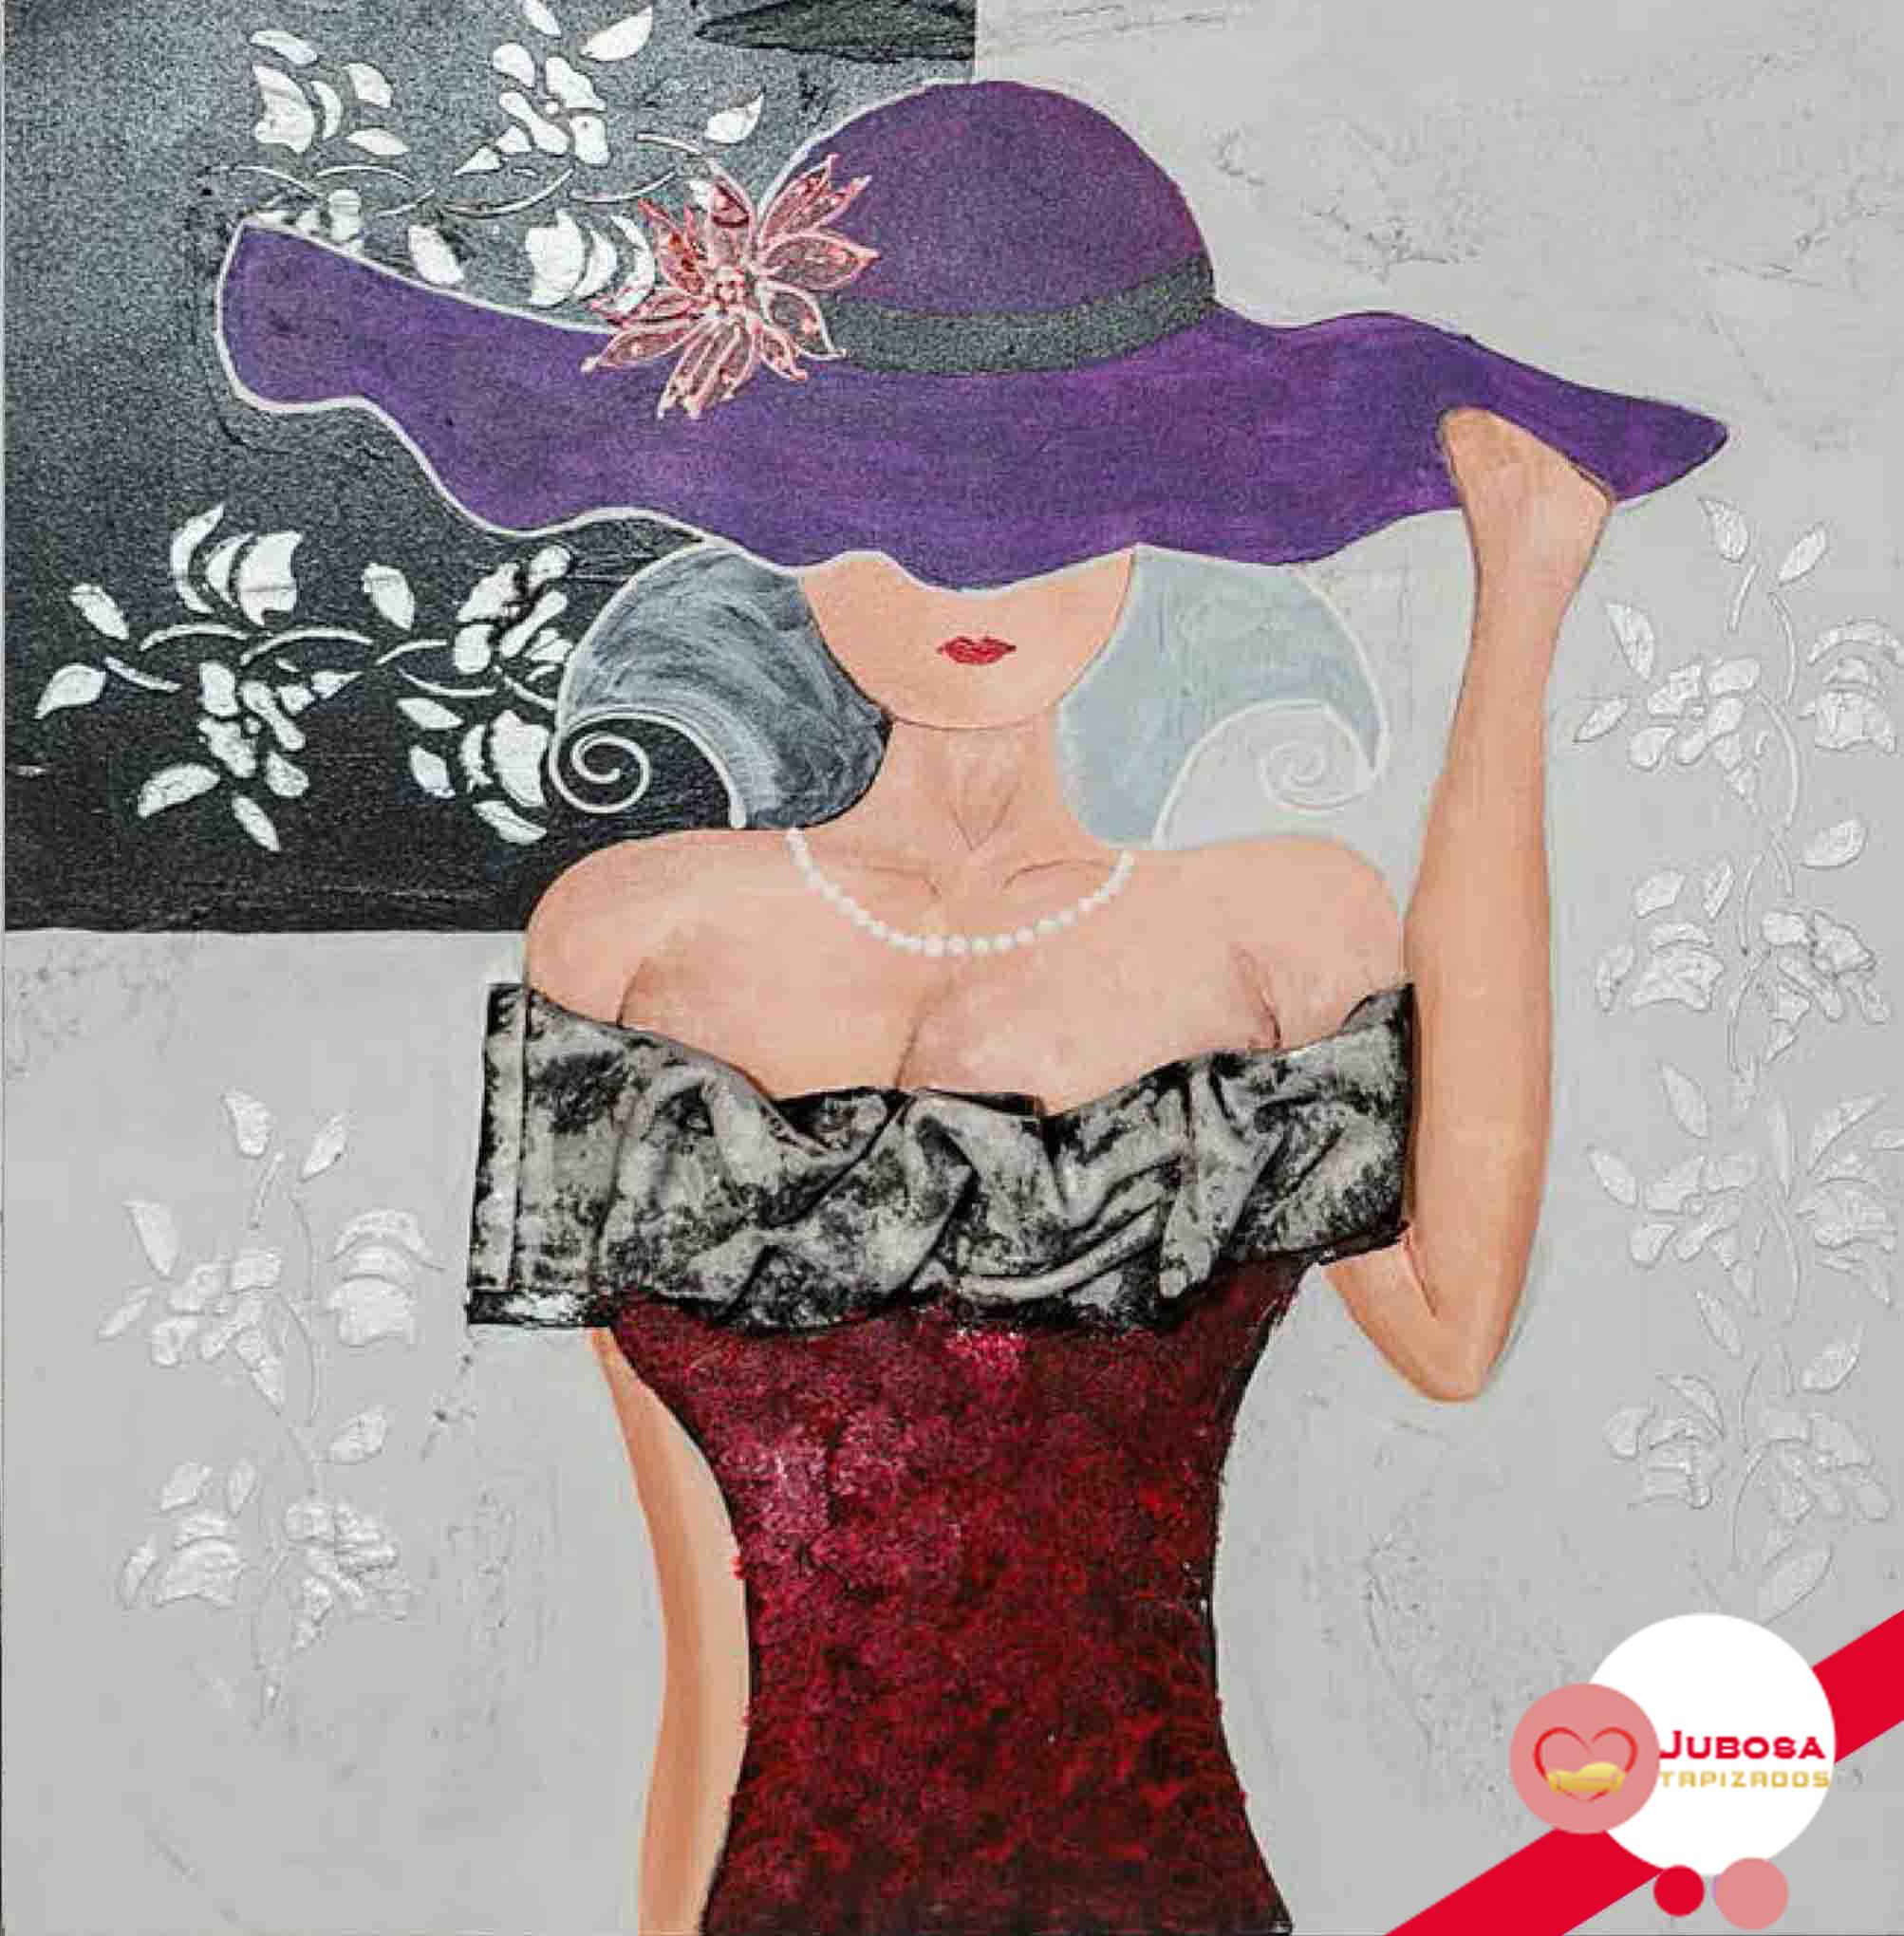 cuadro pamela lila tapizados jubosa